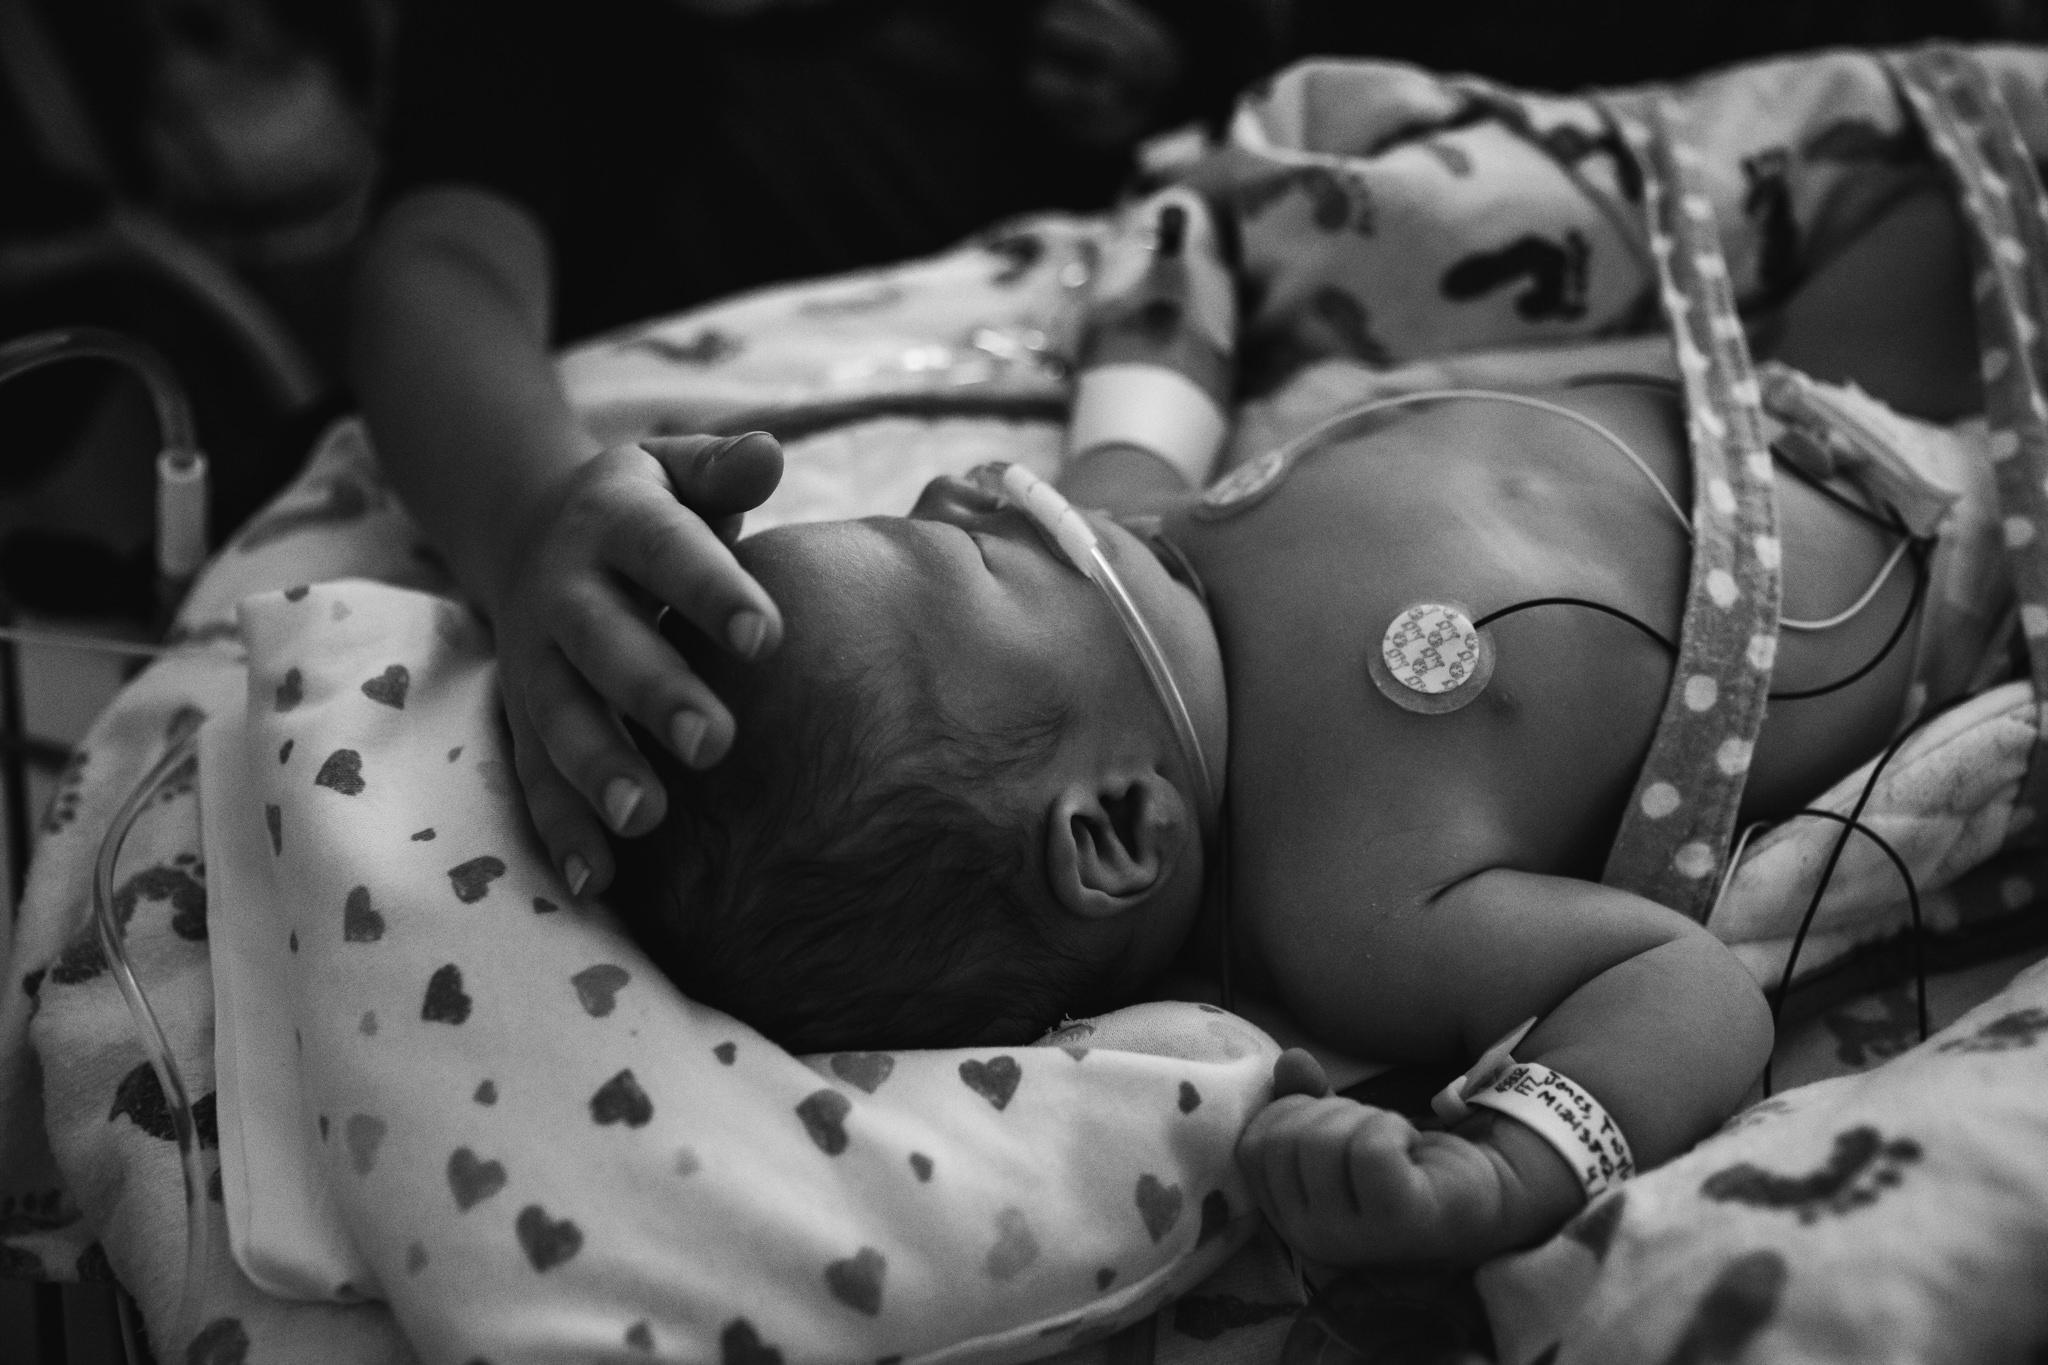 birth-photography-documentary-family-photographer-171.jpg